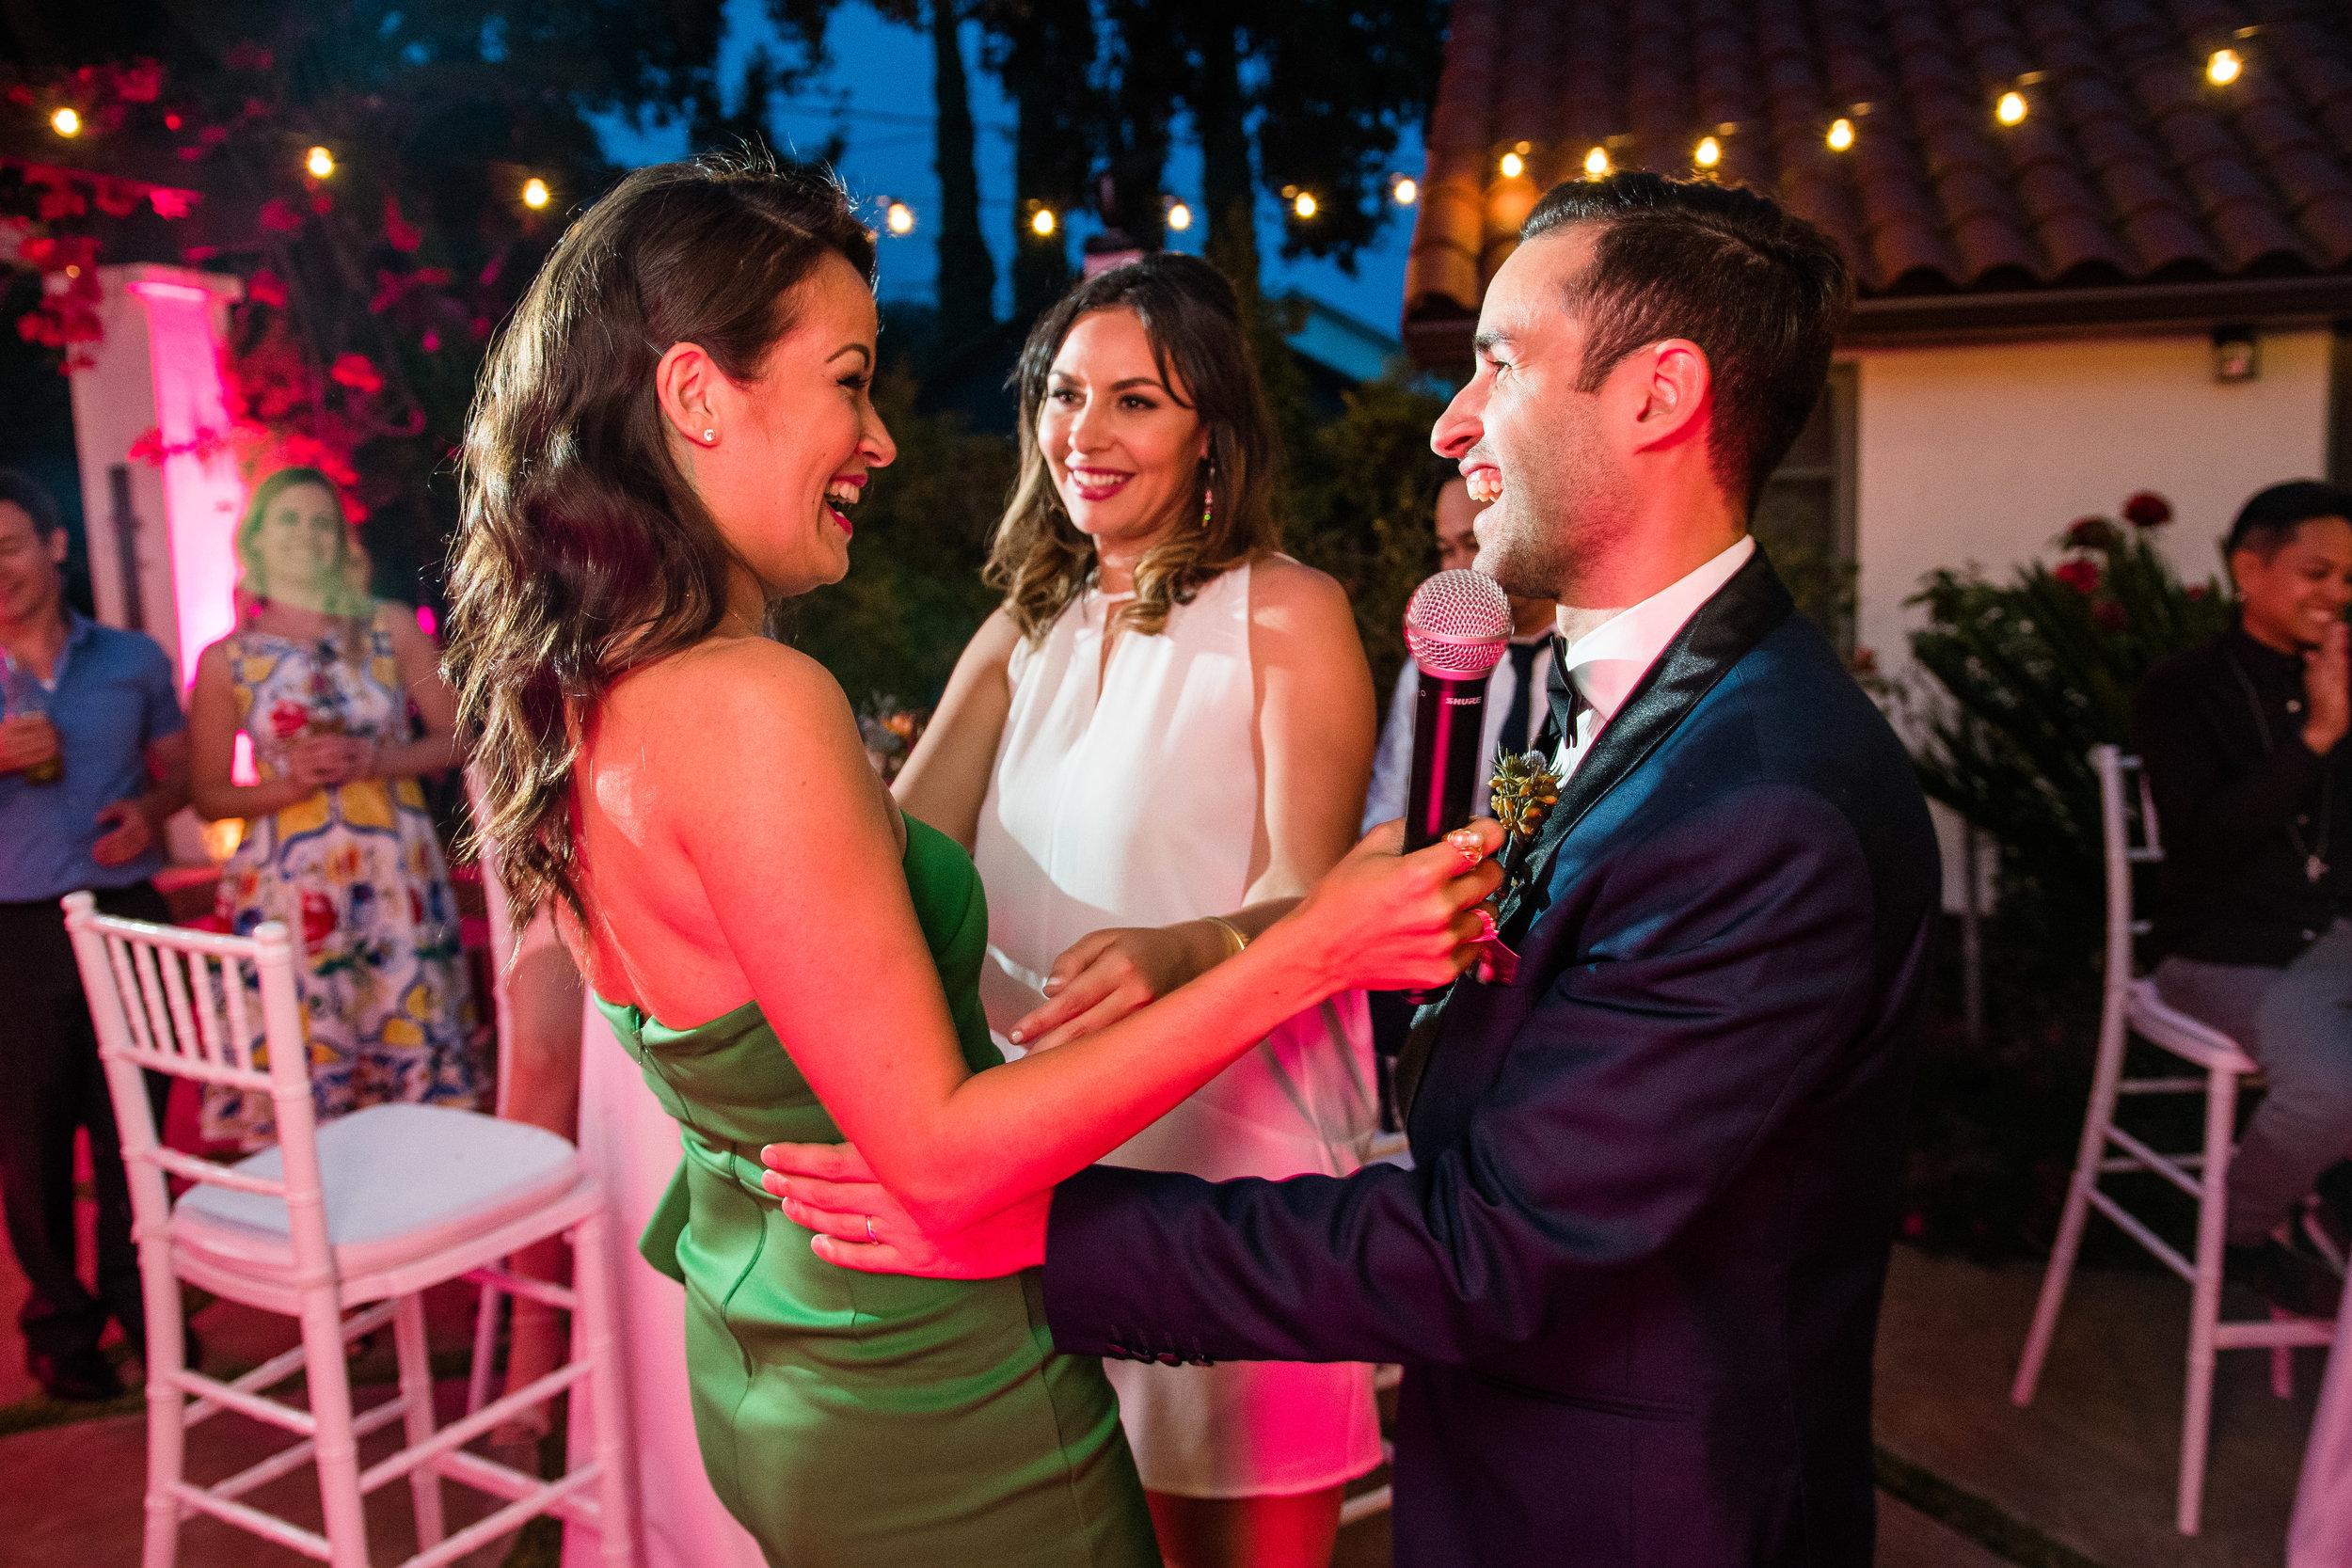 Vibrant Fiesta Backyard Wedding Reception matron of honor with bride and groom.jpg